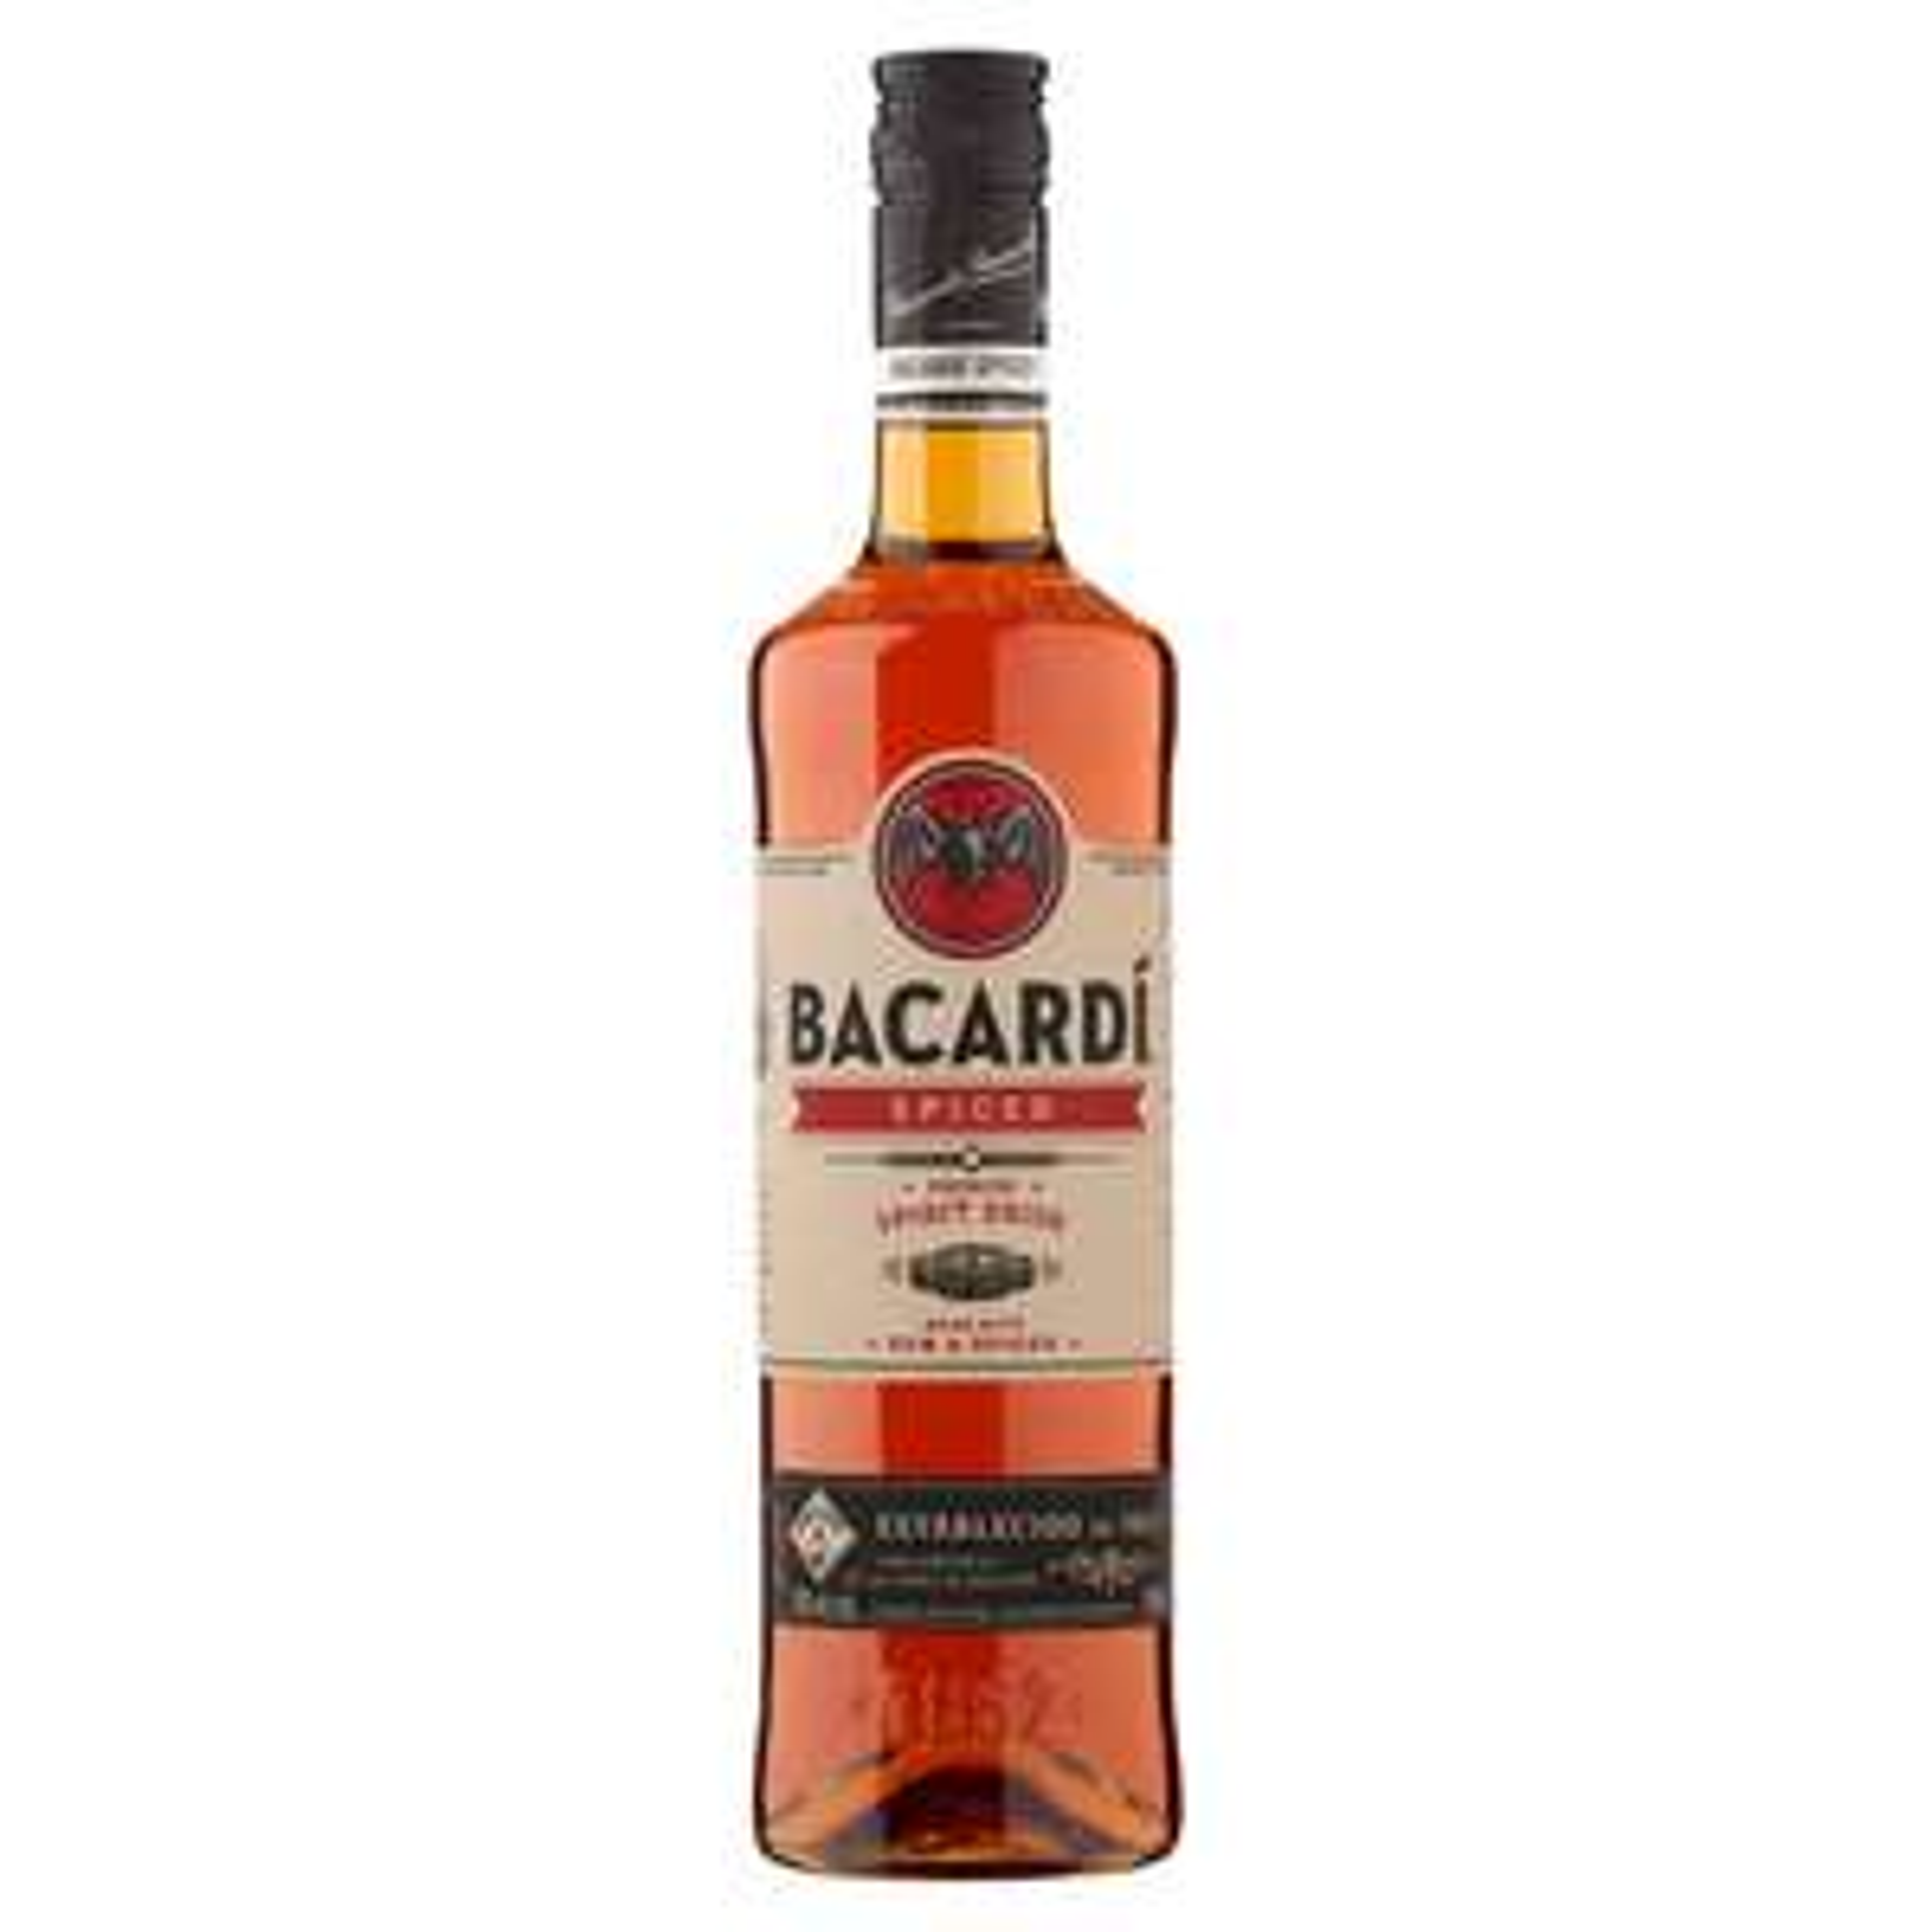 Bacardi Spiced Rum 1L (35% vol) - £17 (Clubcard price) at Tesco